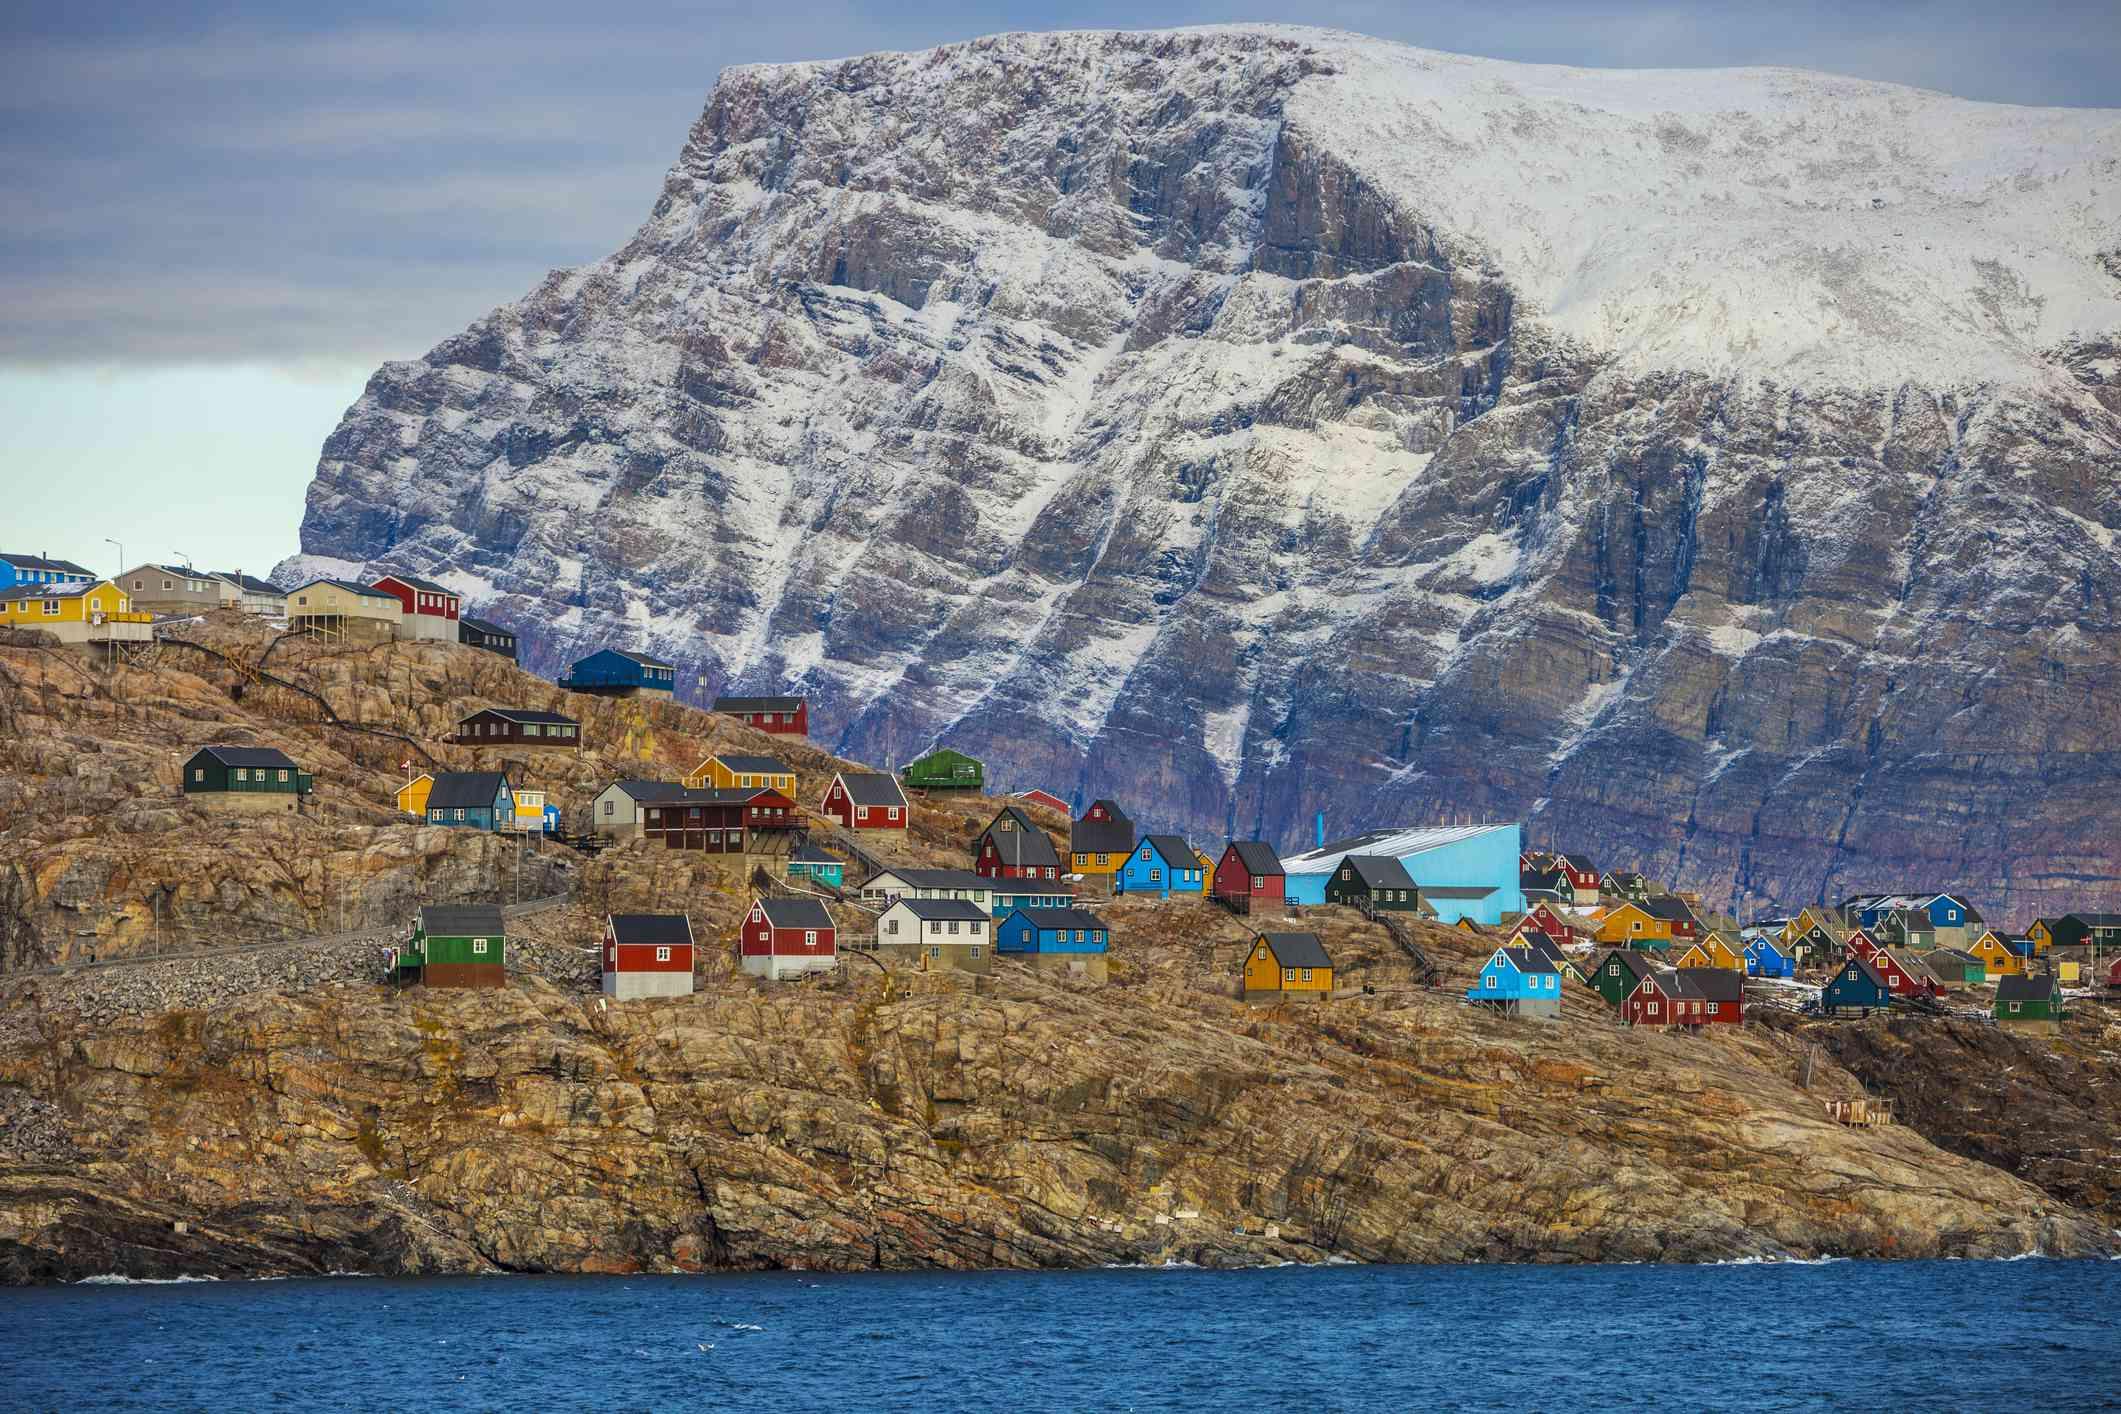 Umanak in Greenland